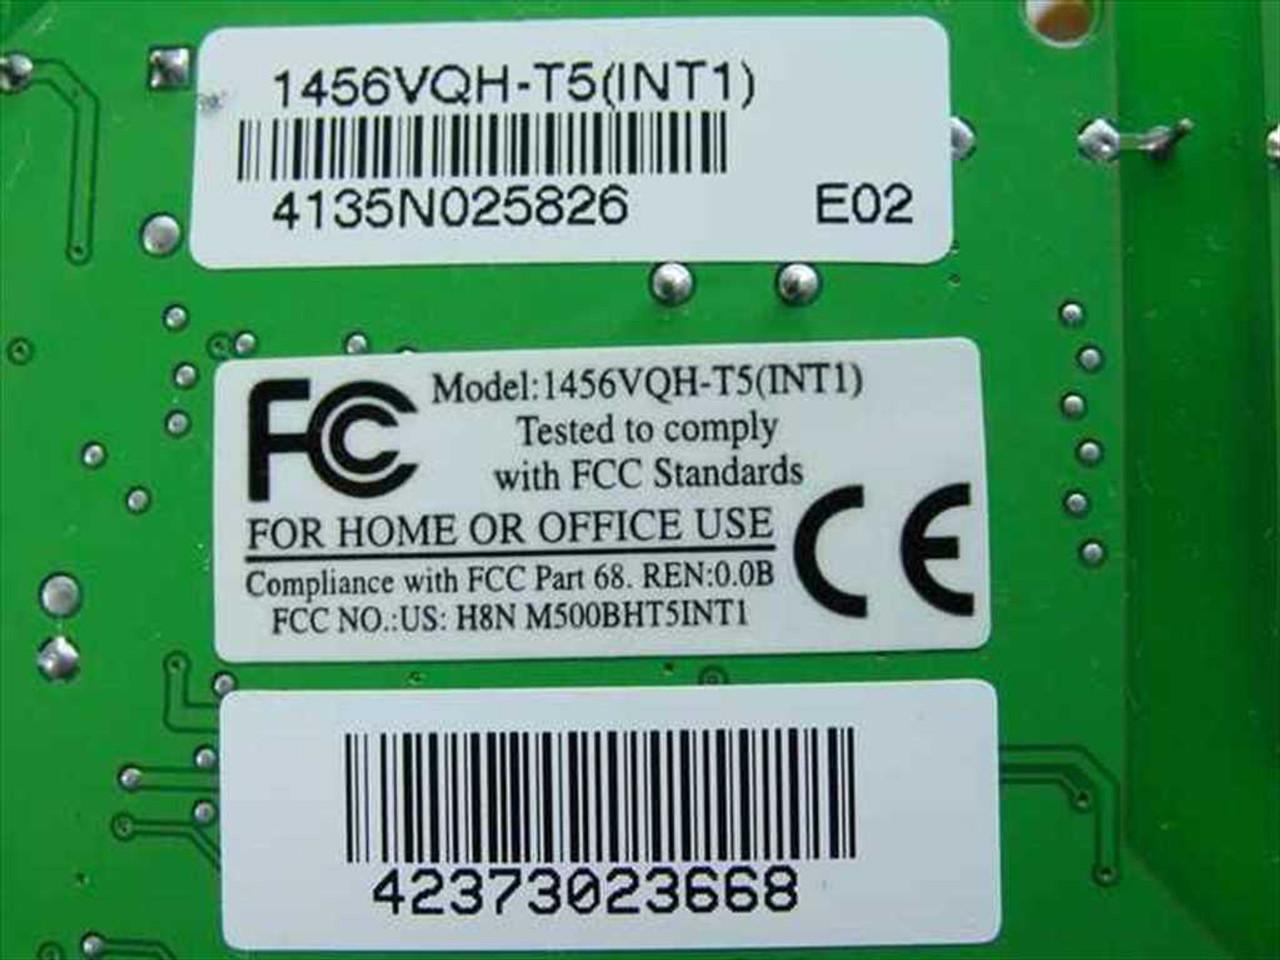 Dynalink 56K Smart PCI Modem (1456VQH-T5) Drivers Download (2019)